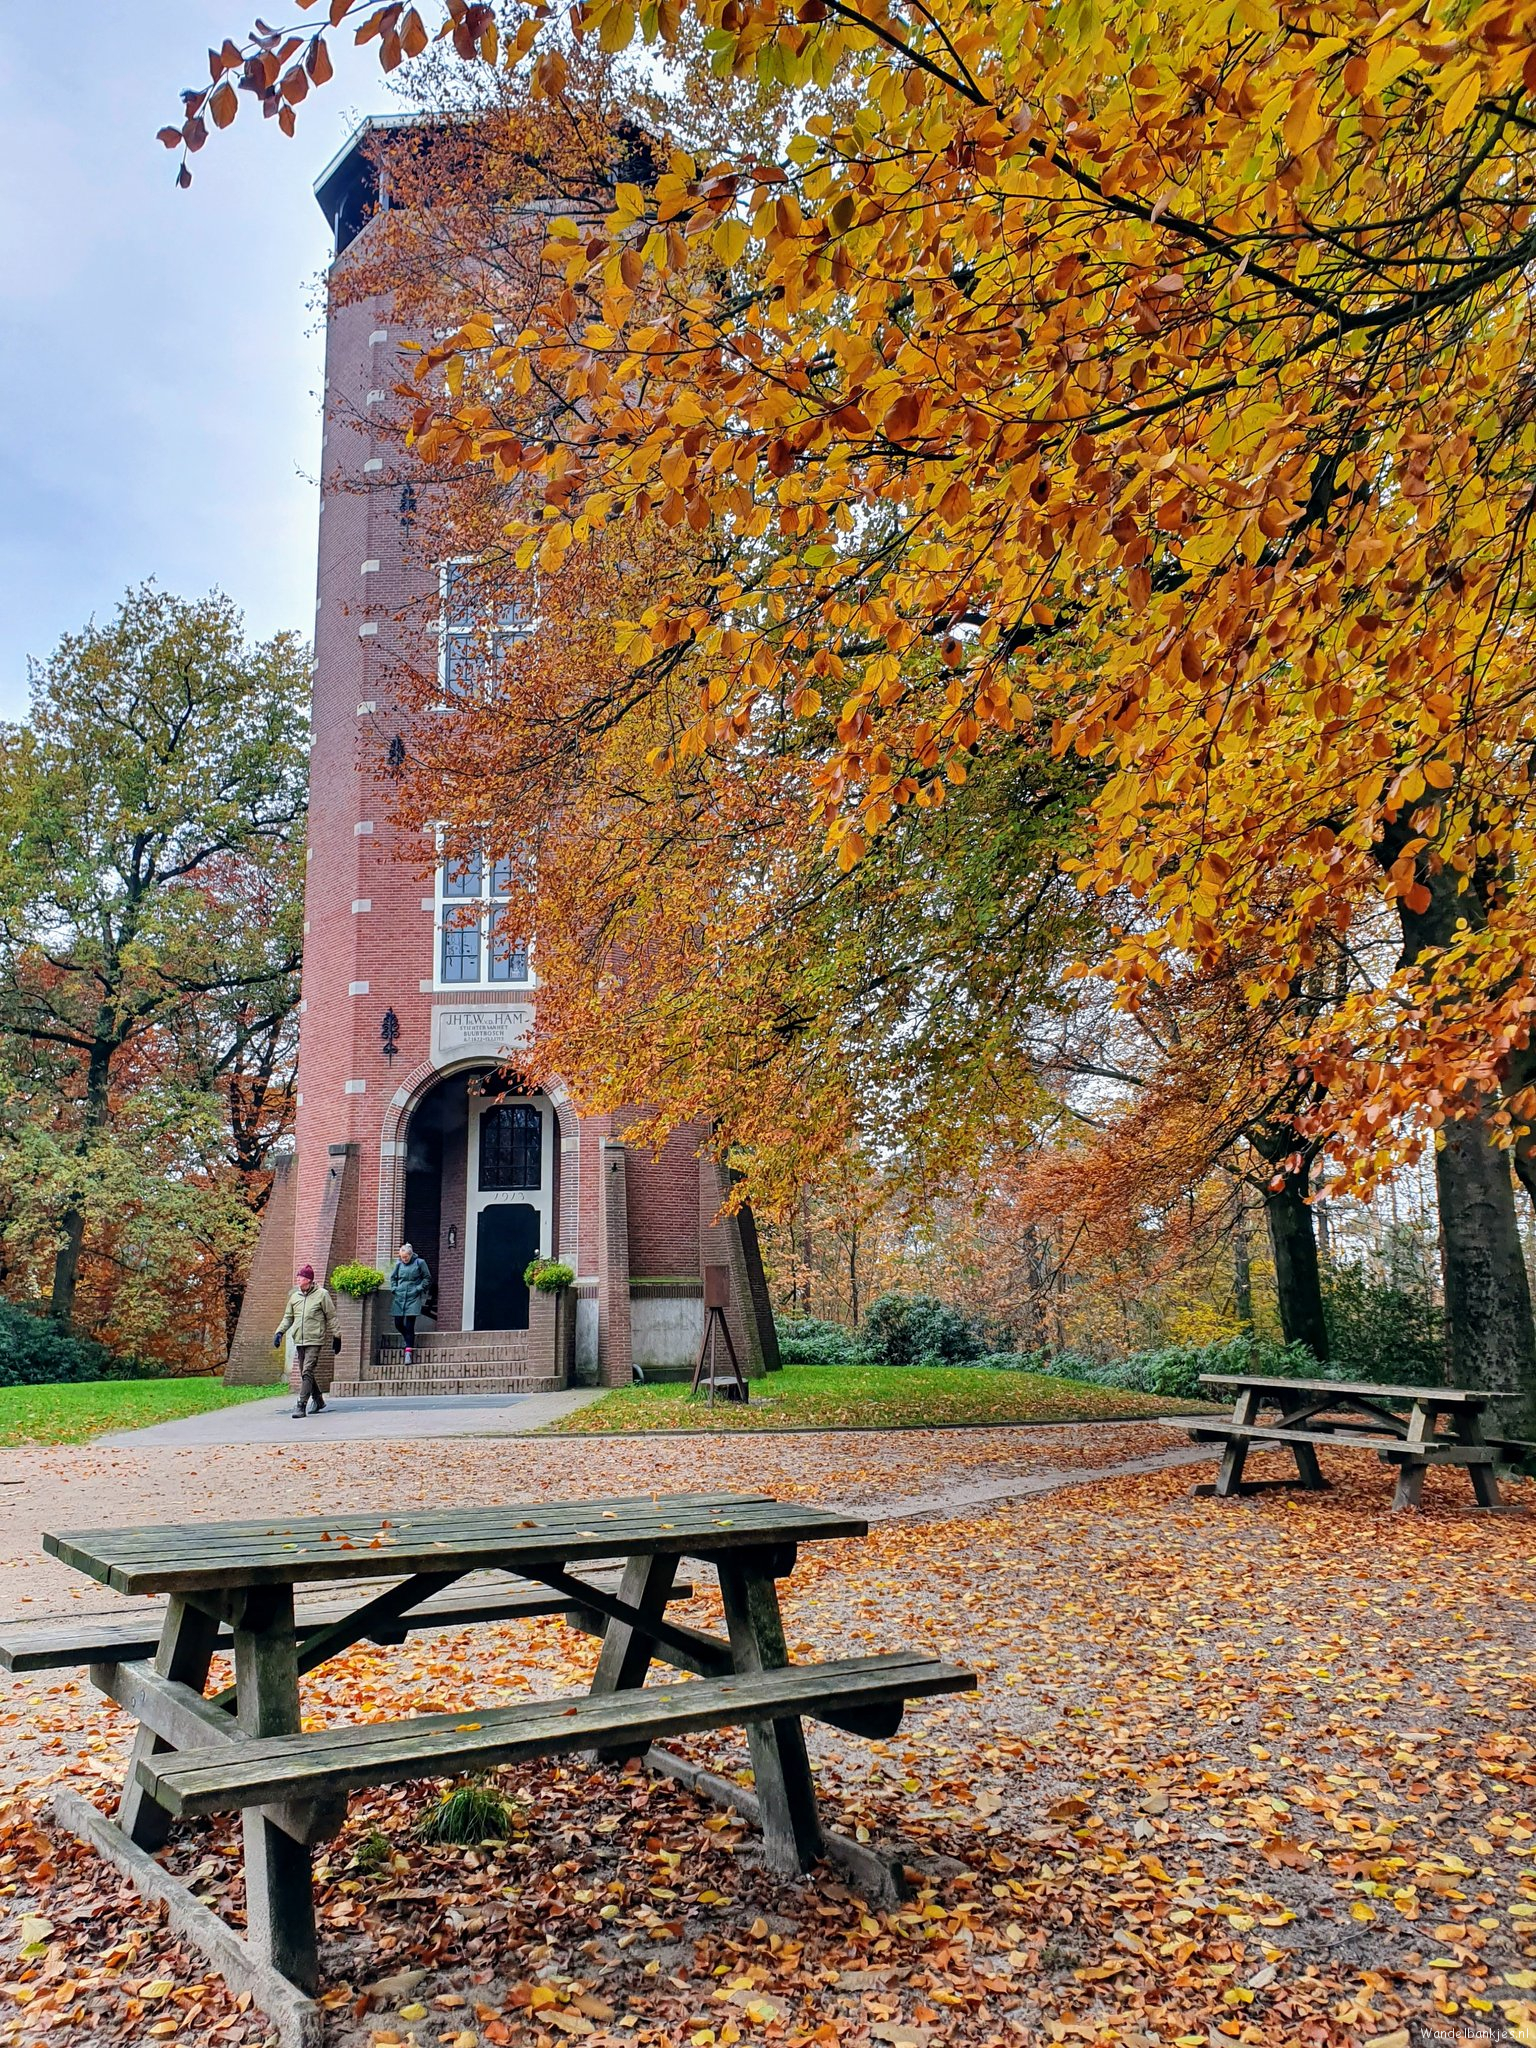 rt-wolfswandelplan-koepel-in-het-luntersche-buurtbosch-wandelbankjes-https-t-co-cac5fvkrfh